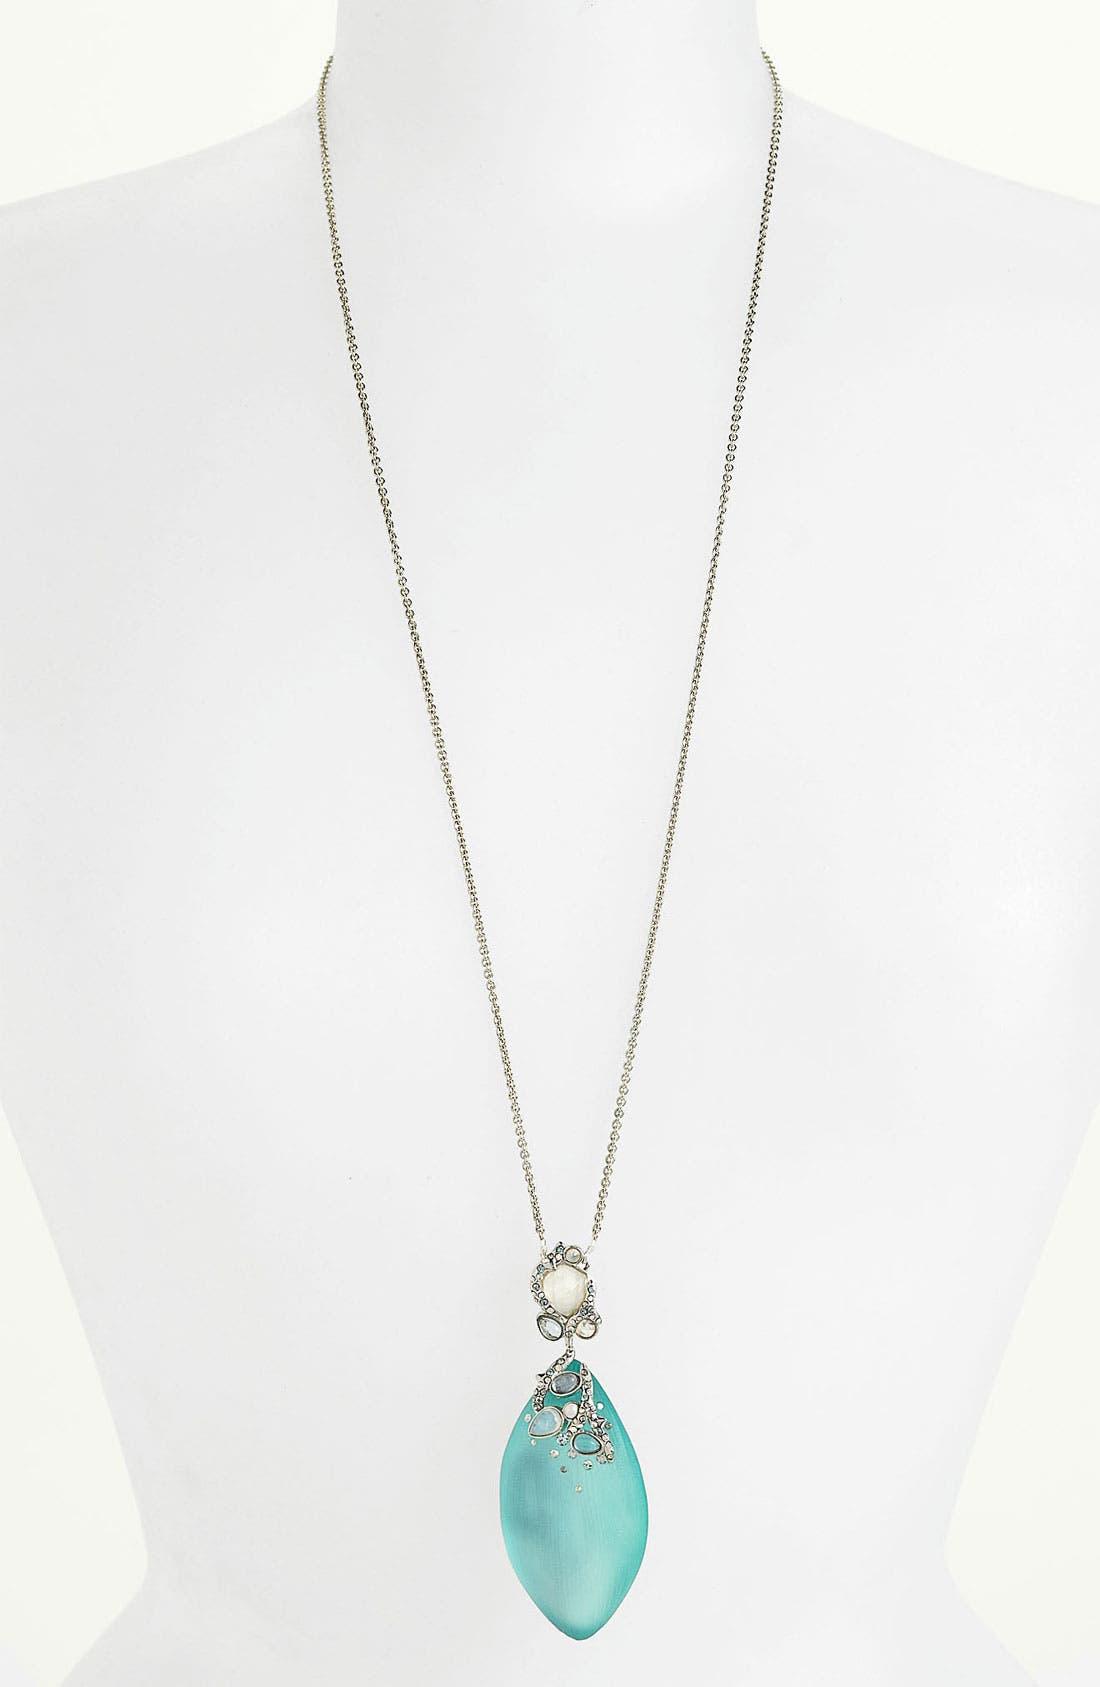 Main Image - Alexis Bittar 'Wanderlust' Pendant Necklace